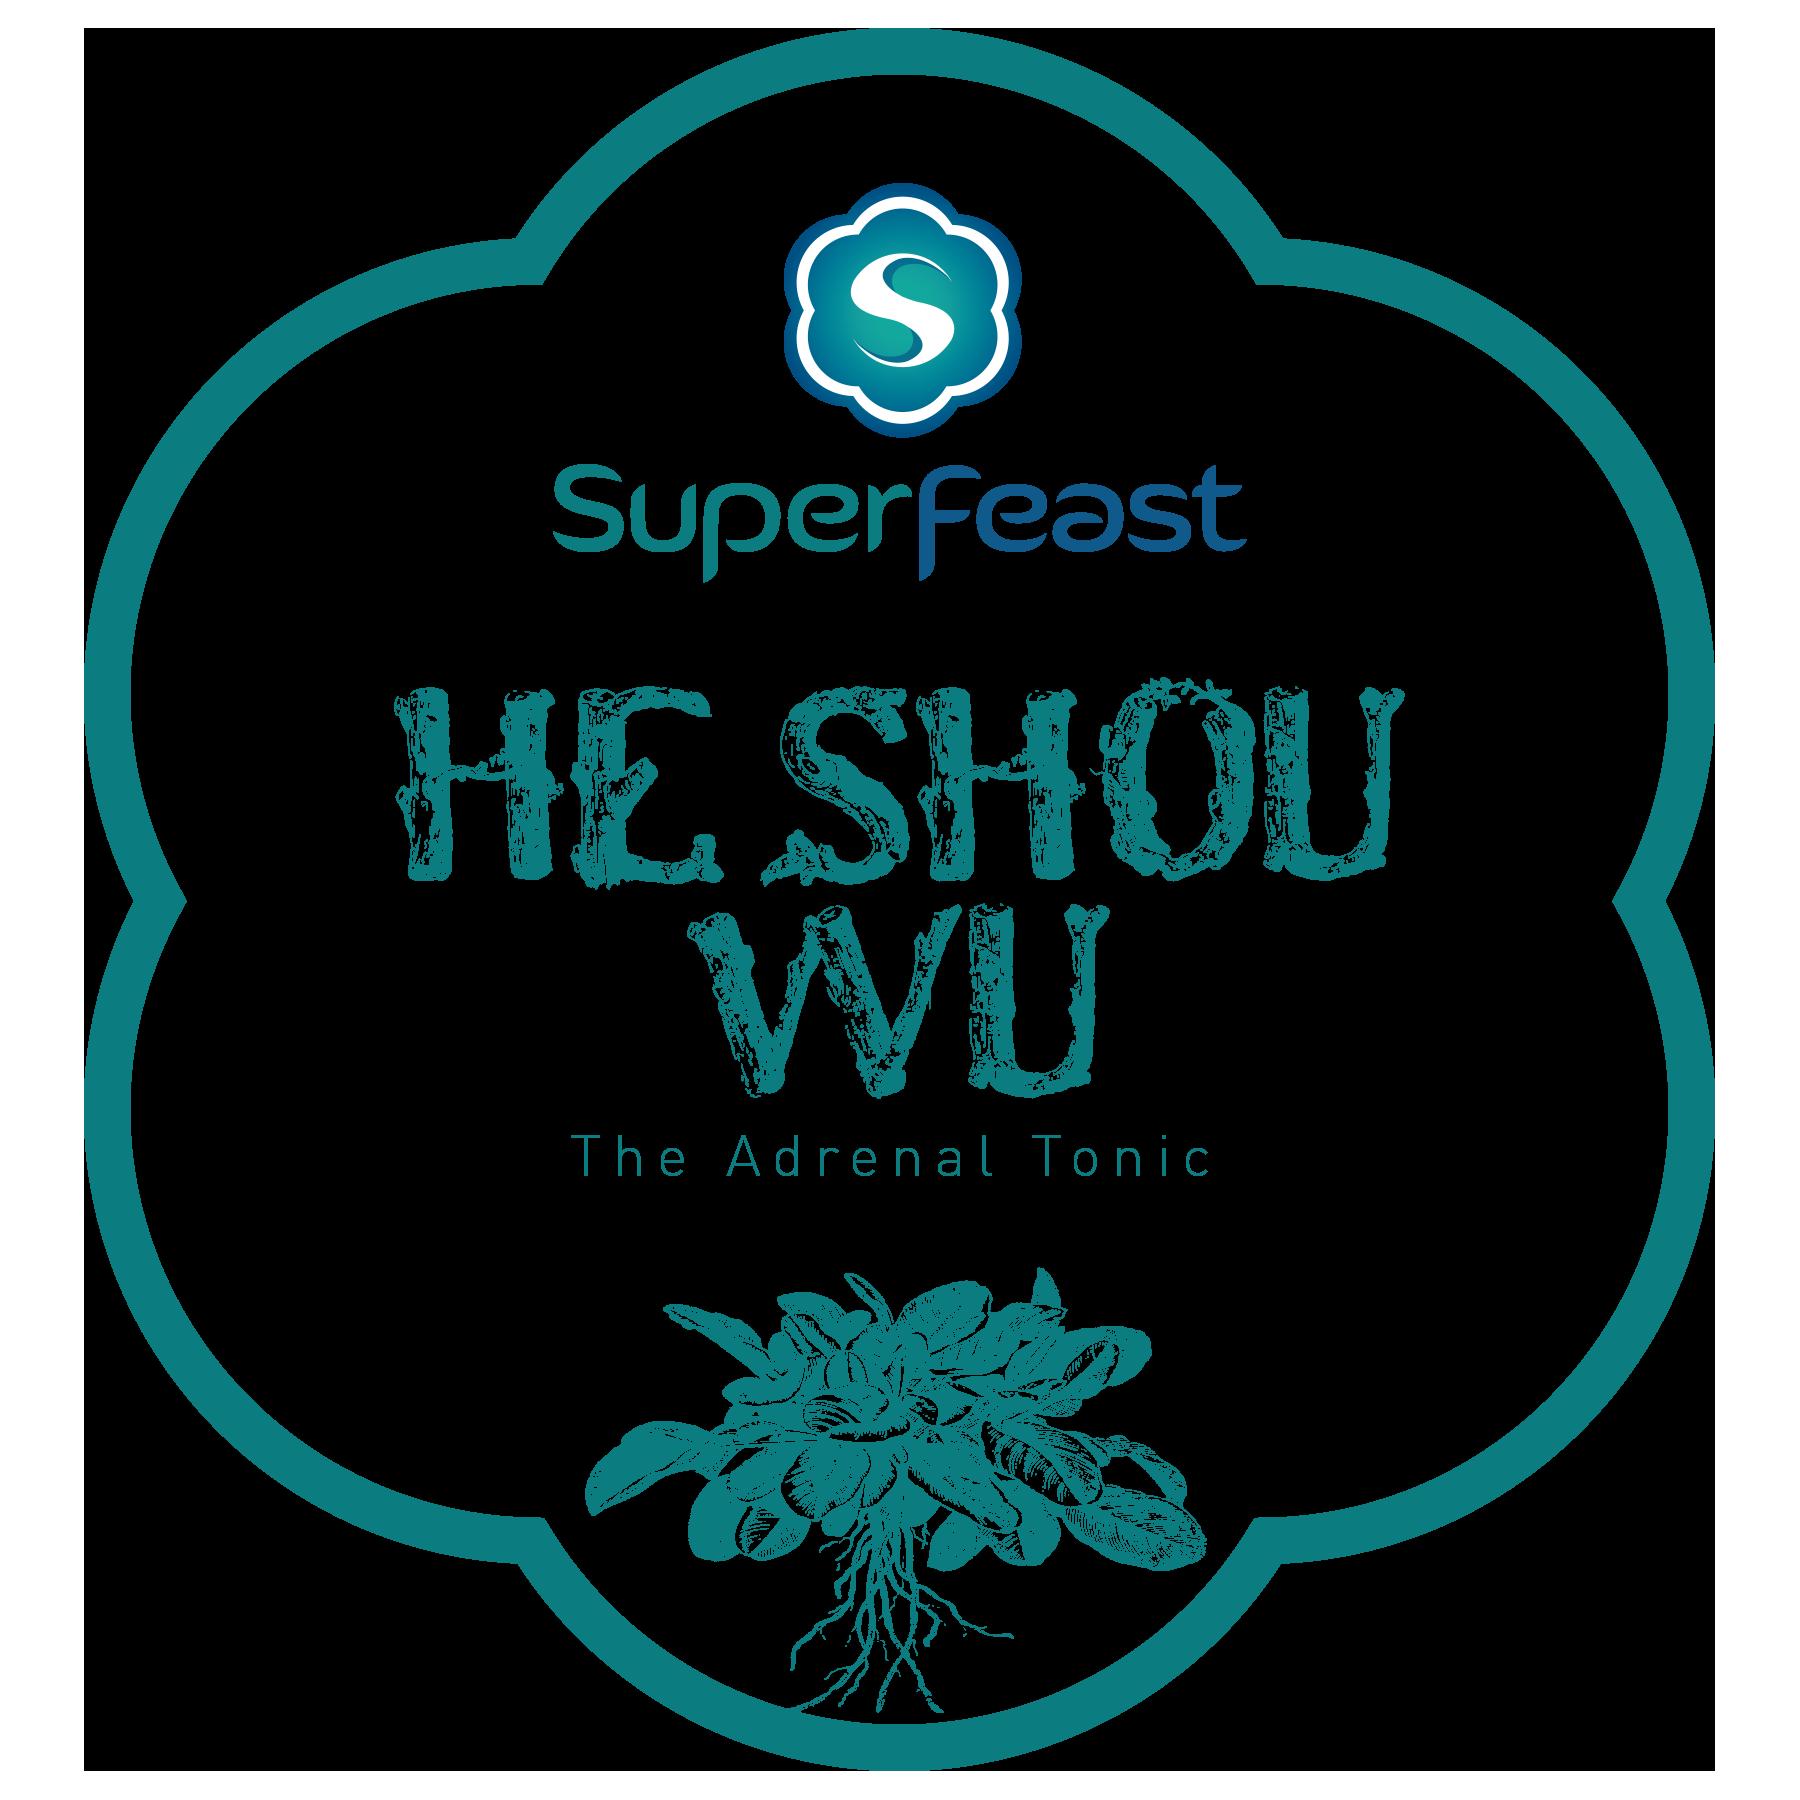 He Shou Wu Root Powdered Extract   +THE ADRENAL TONIC  +